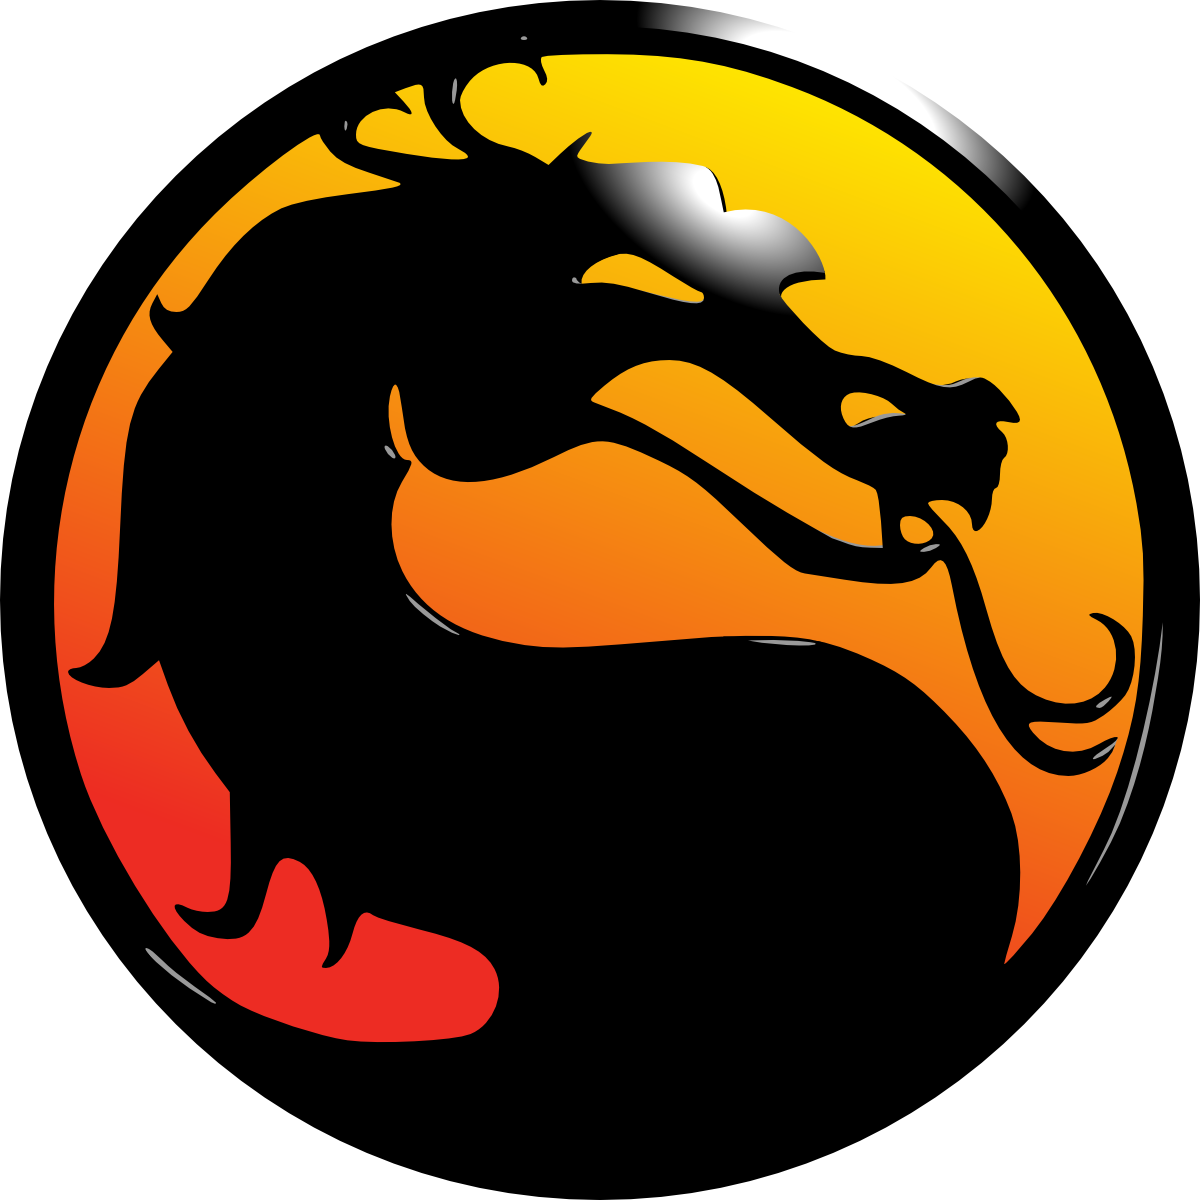 Mortal kombat logo.